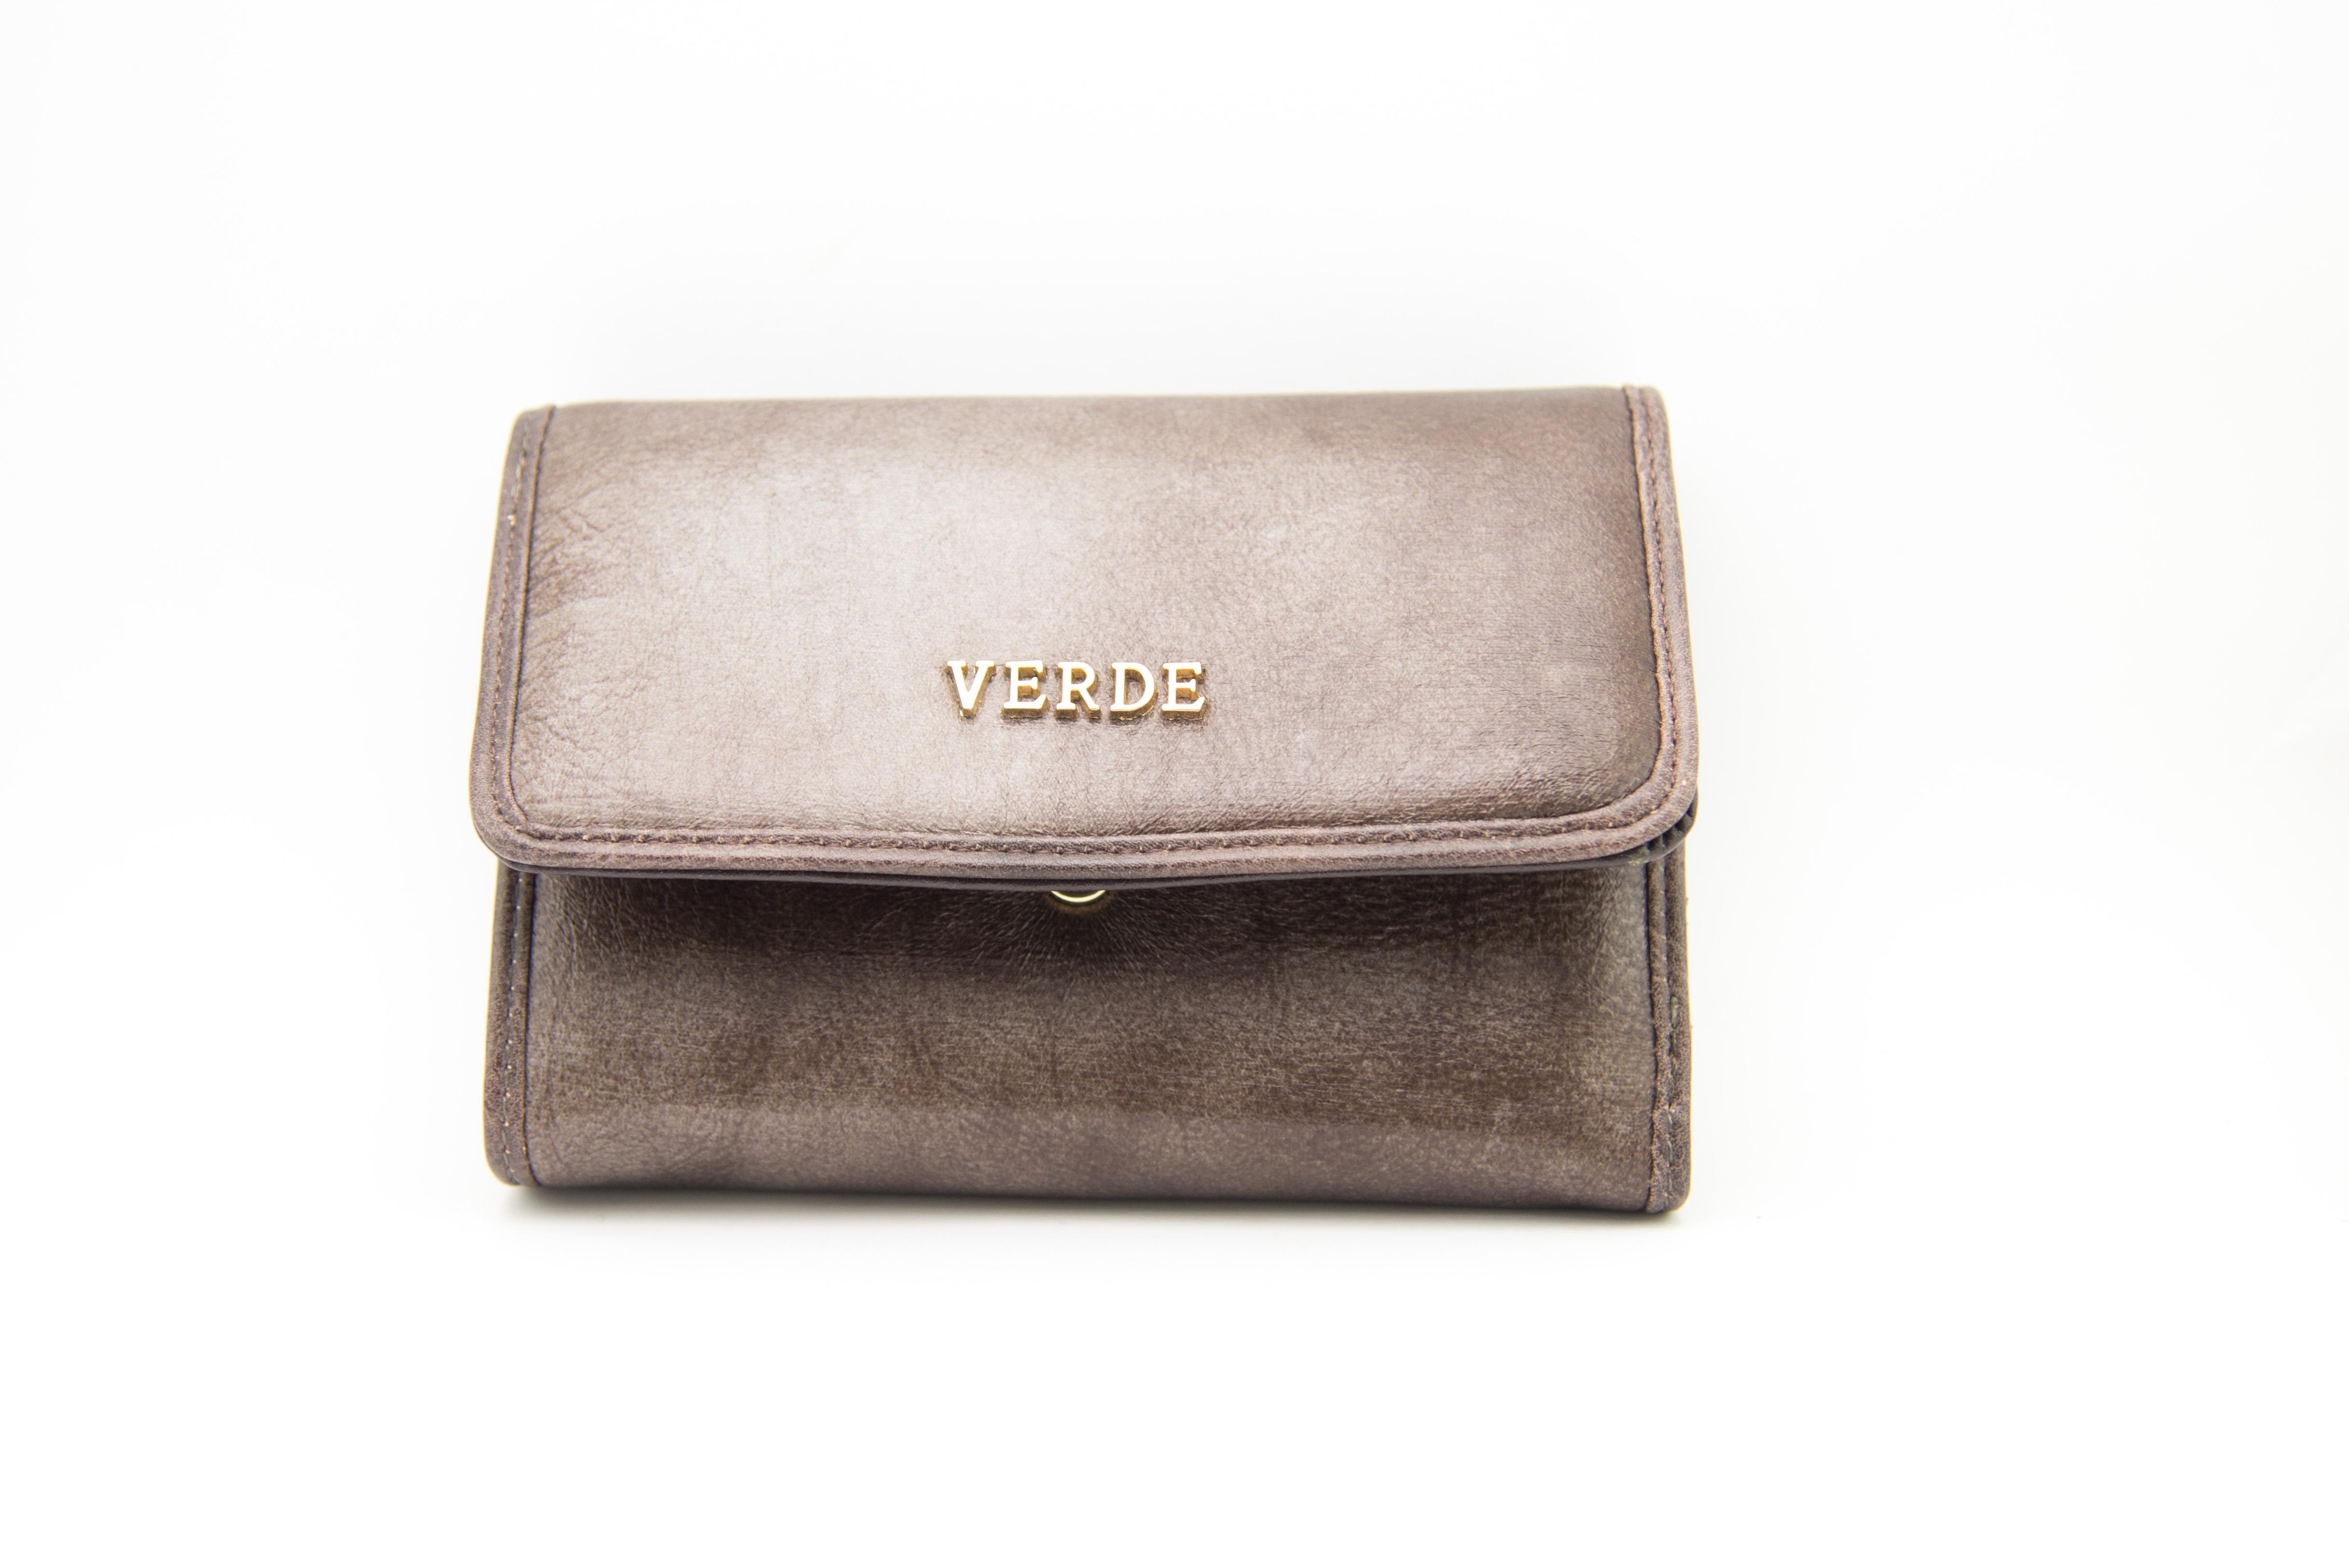 Vintage style brown wallet | Women's vintage wallets online